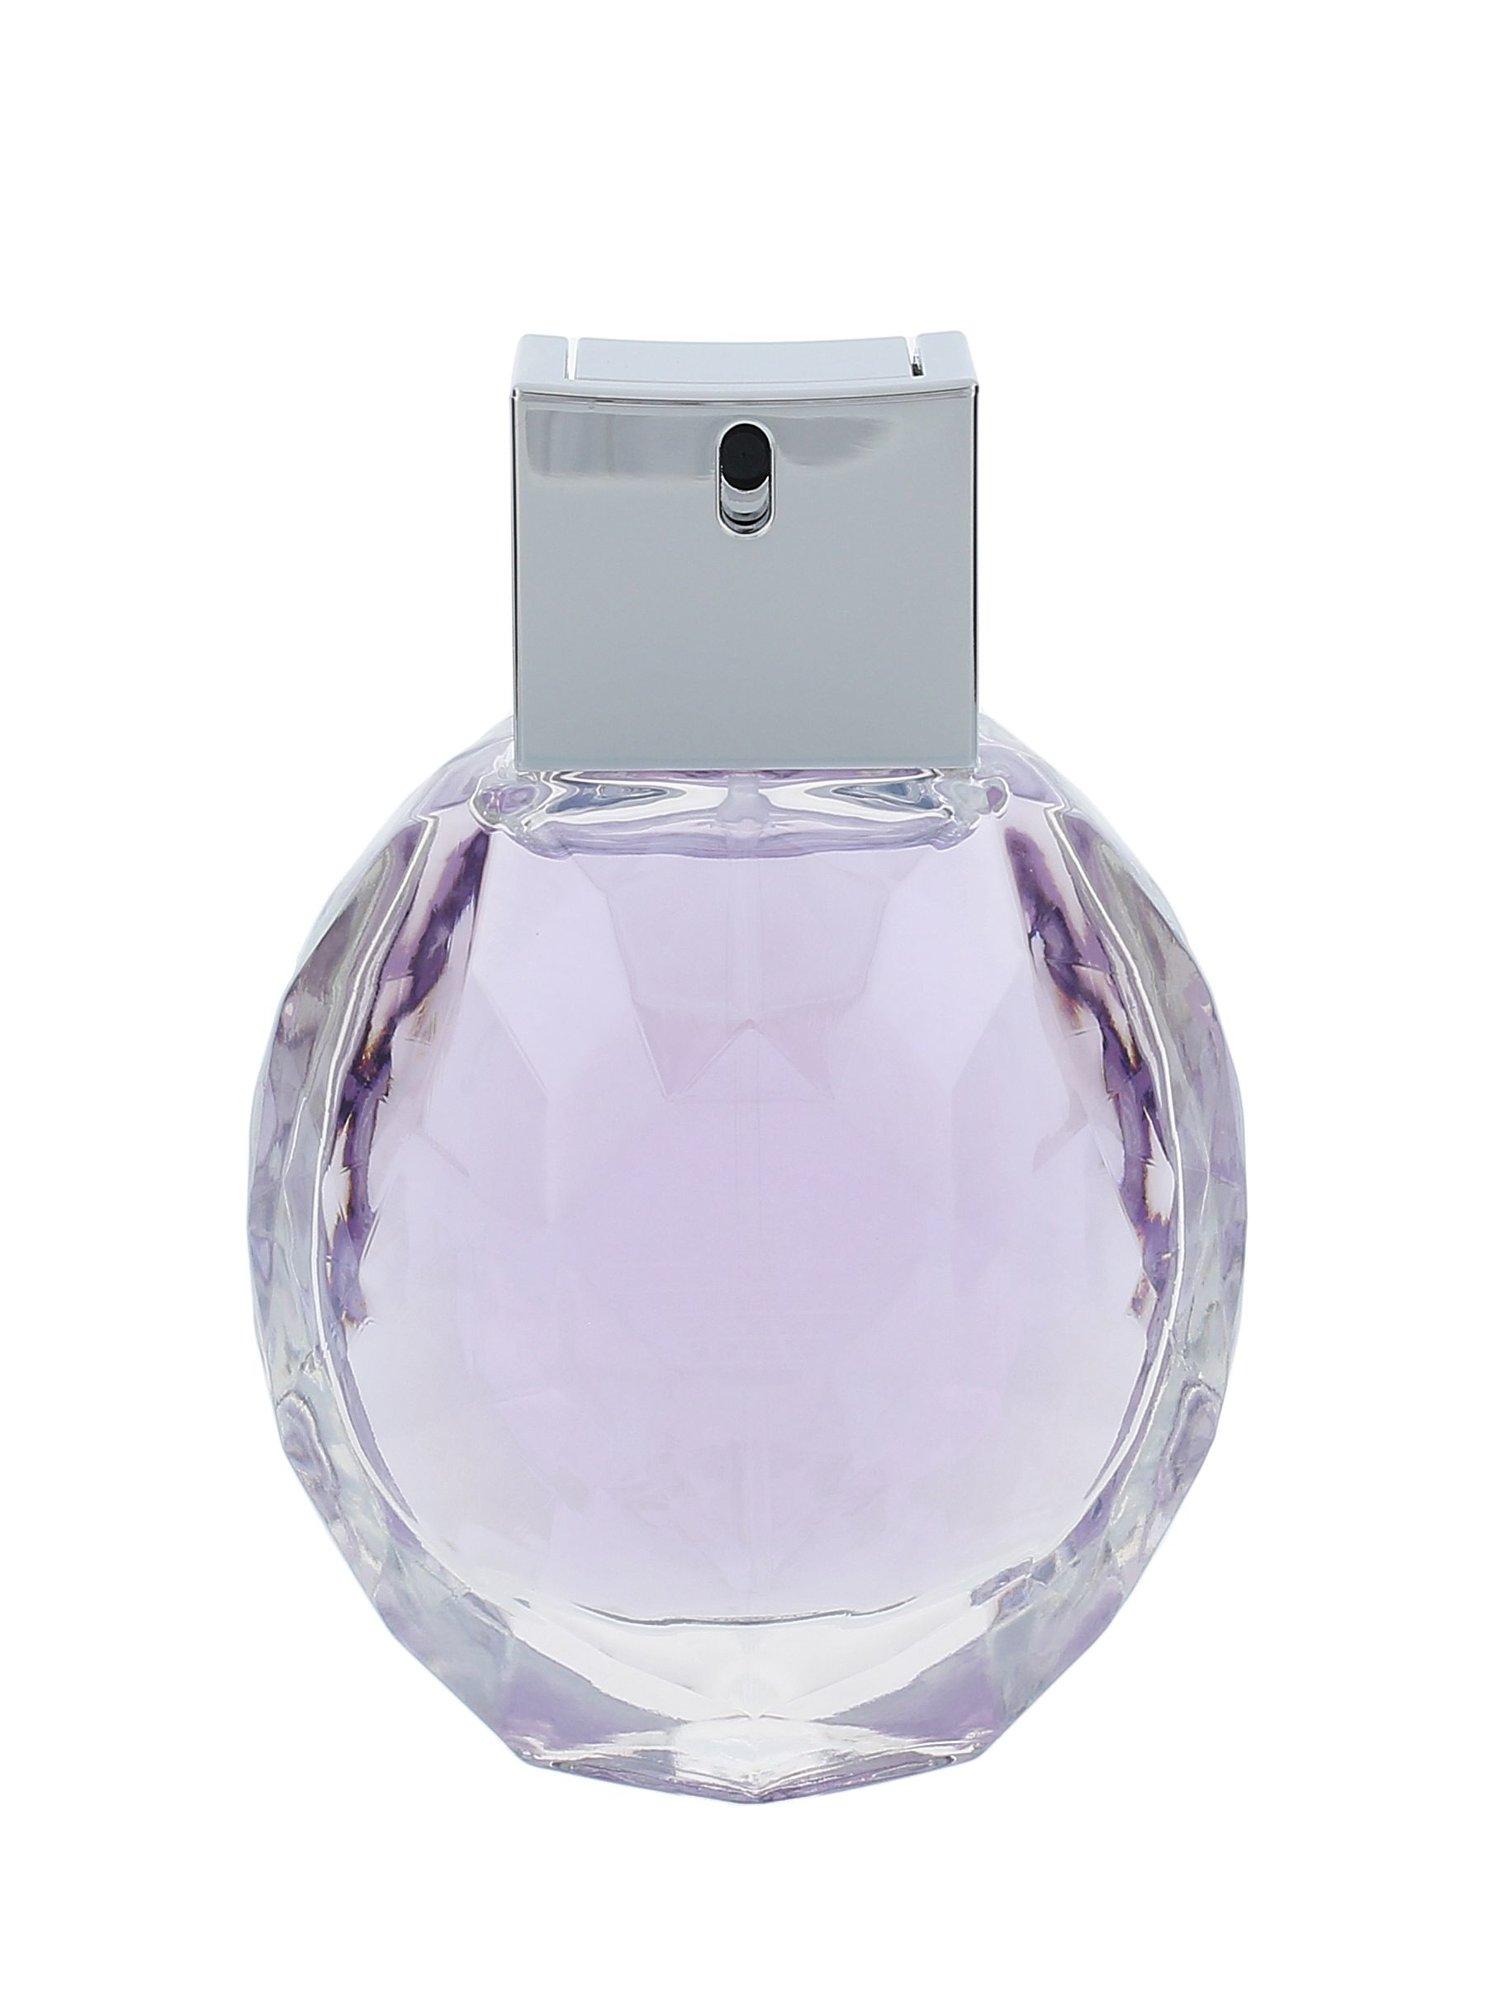 Giorgio Armani Emporio Armani Diamonds Violet Eau de Parfum 50ml